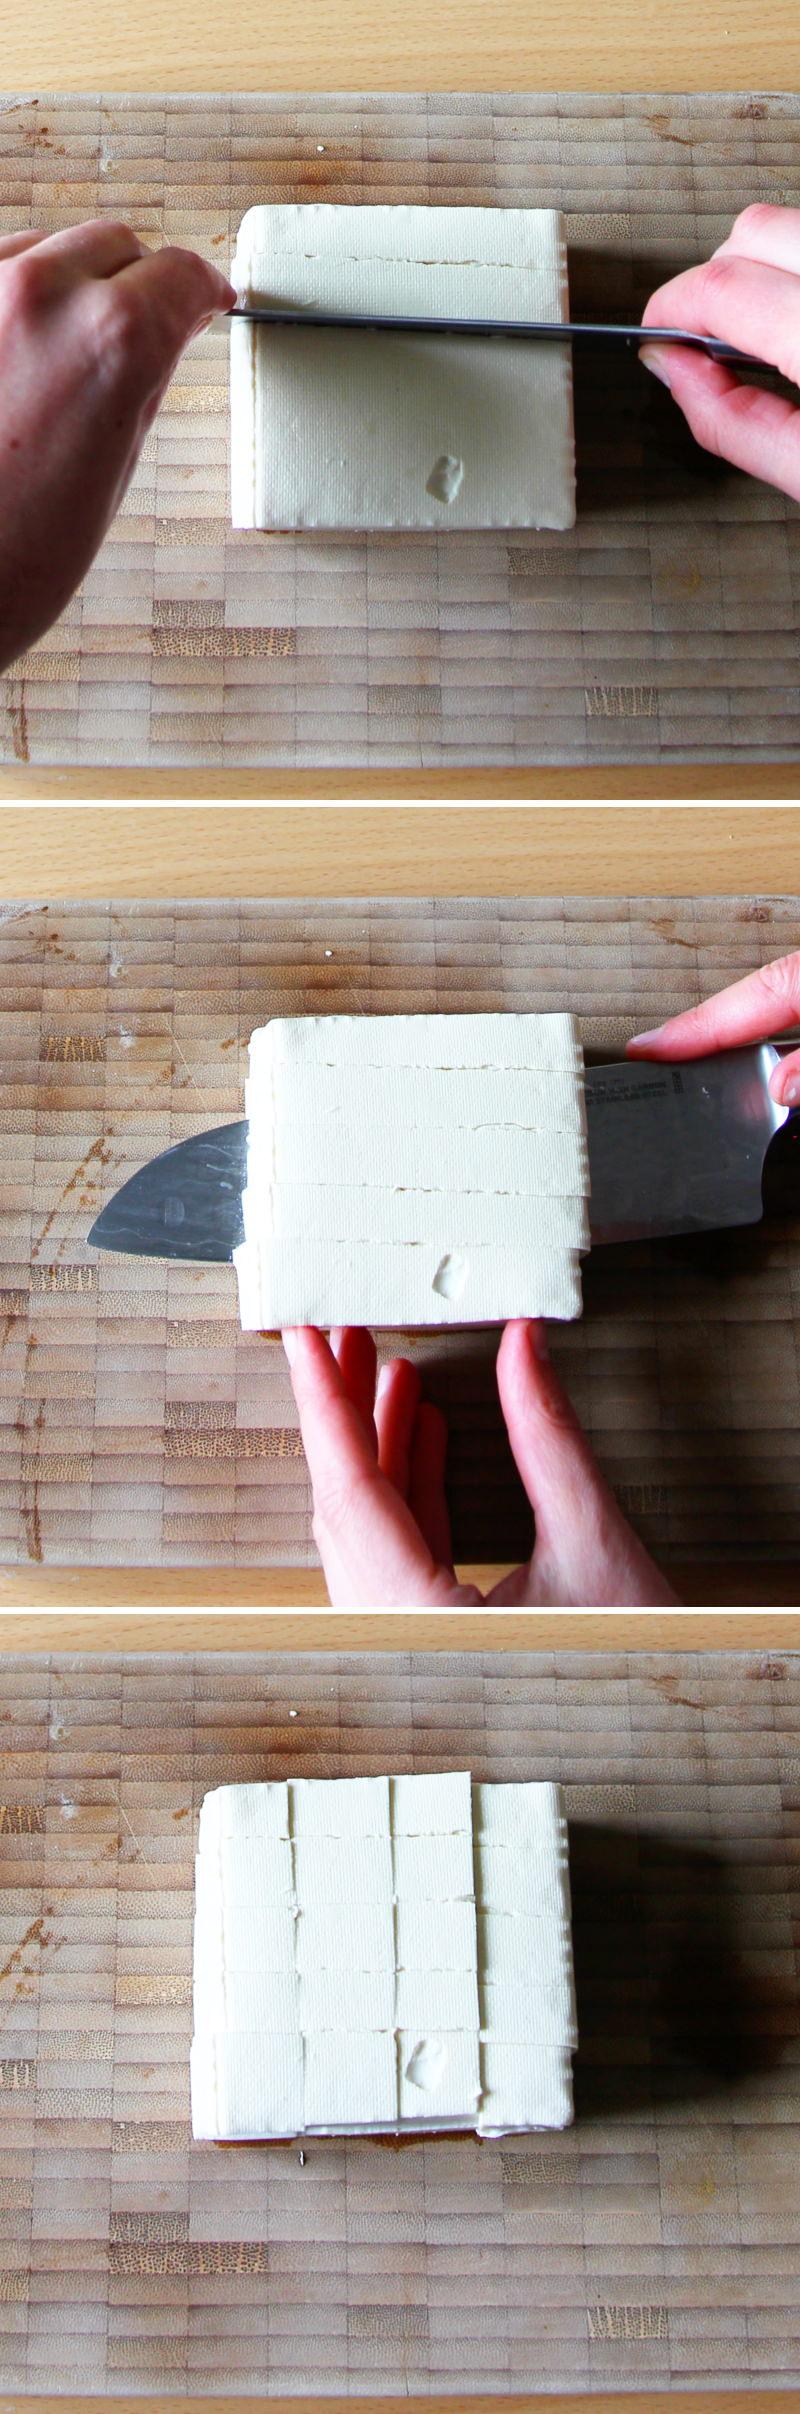 Mapo Tofu Schritt 2 Tofu schneiden